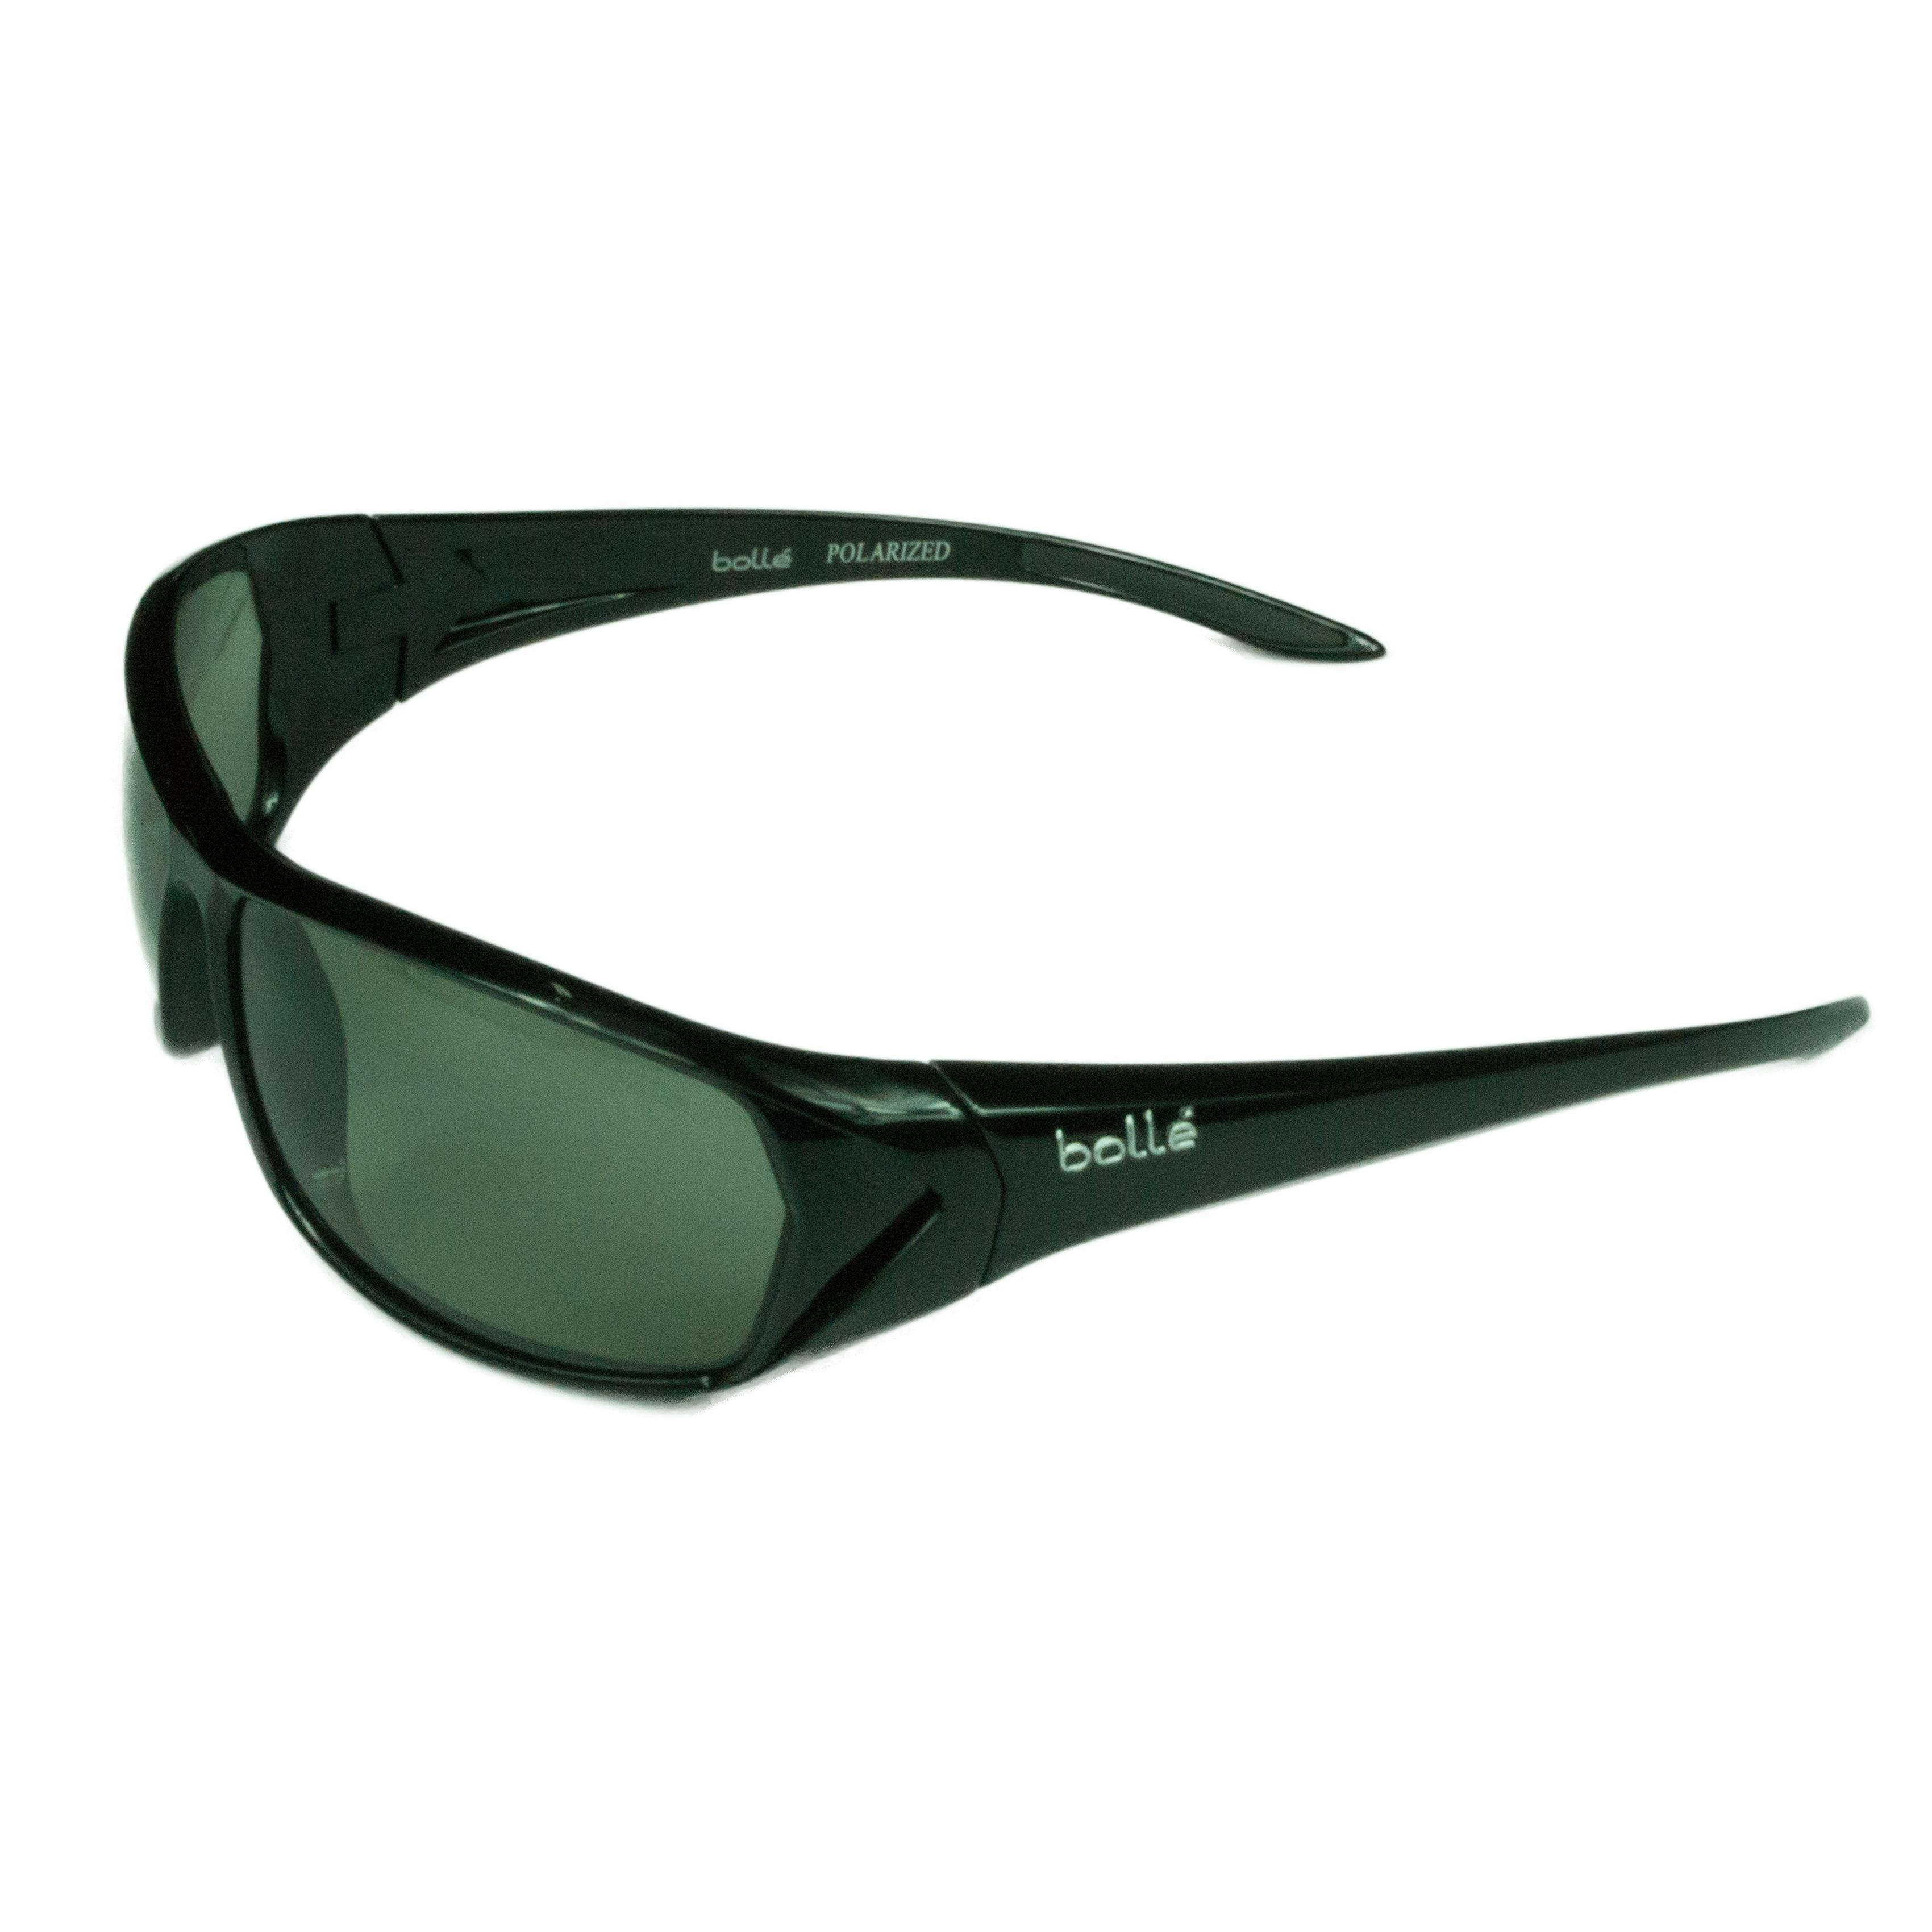 fbb6167af6 Bolle Sport Mens Blacktail 12085 Shiny Black w  Modulator Polarized Grey  Lens Sunglasses